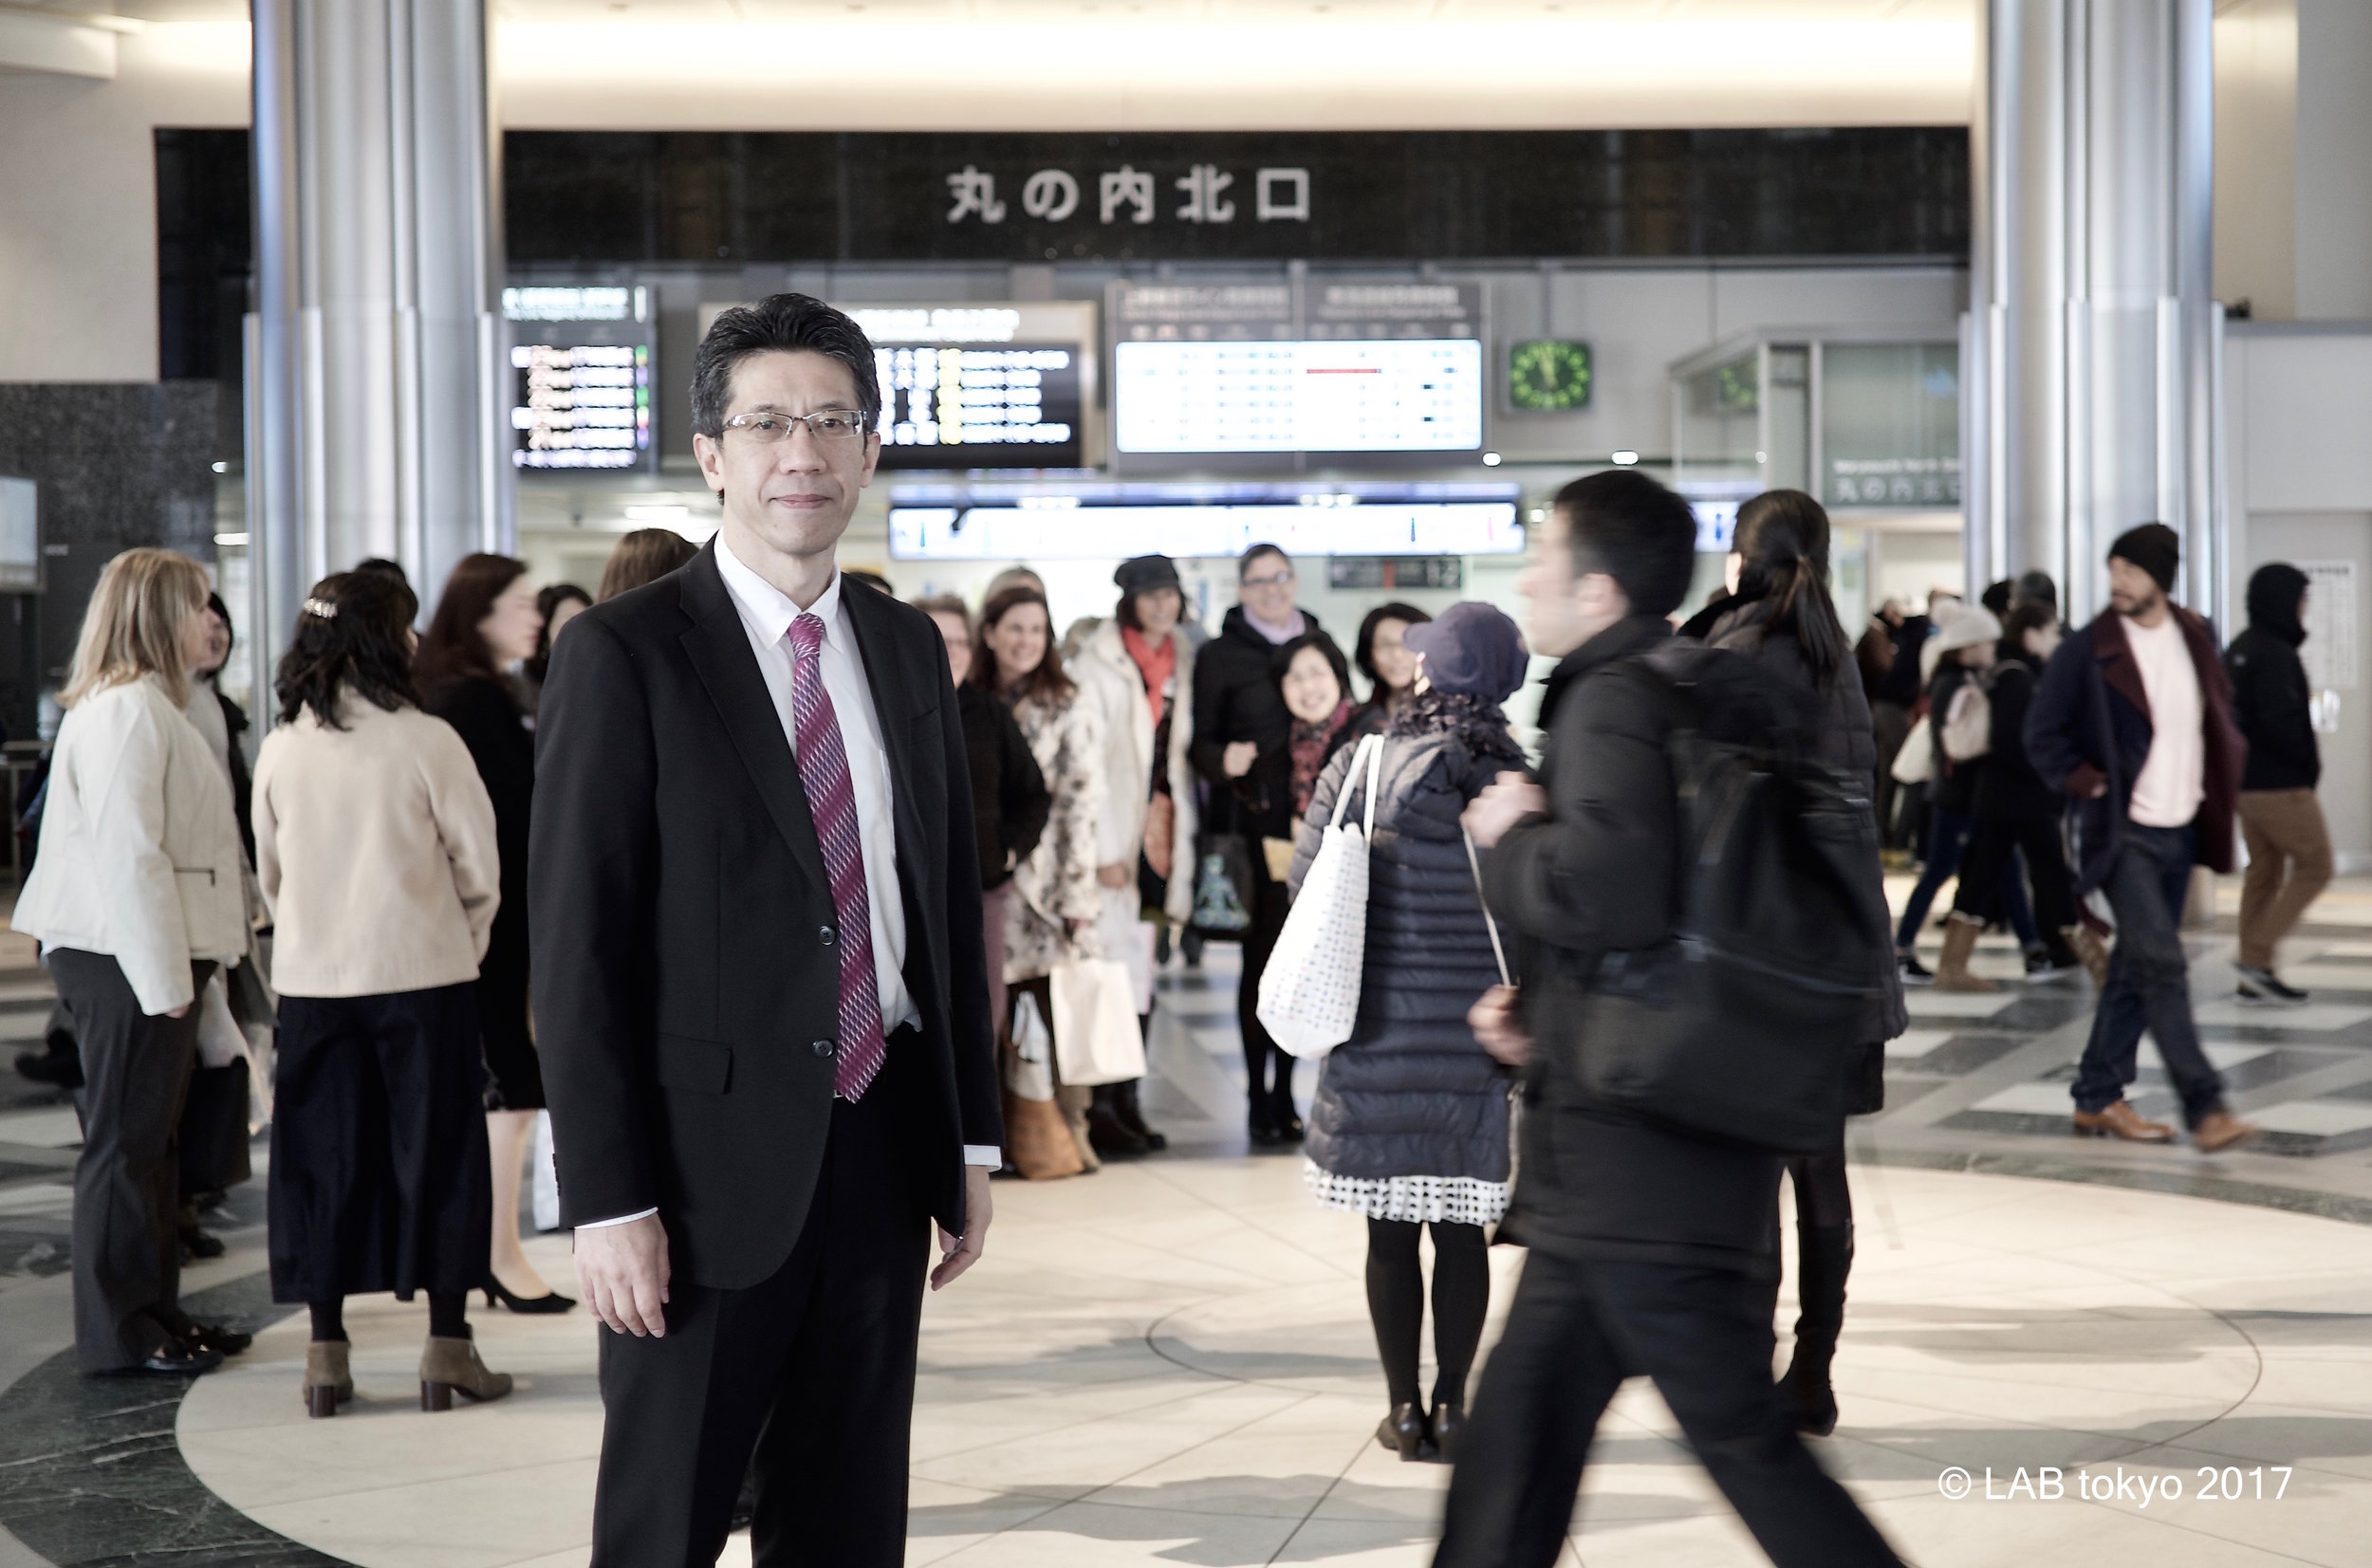 Takashi Iizuka - Finance Specialist and Entrepreneur